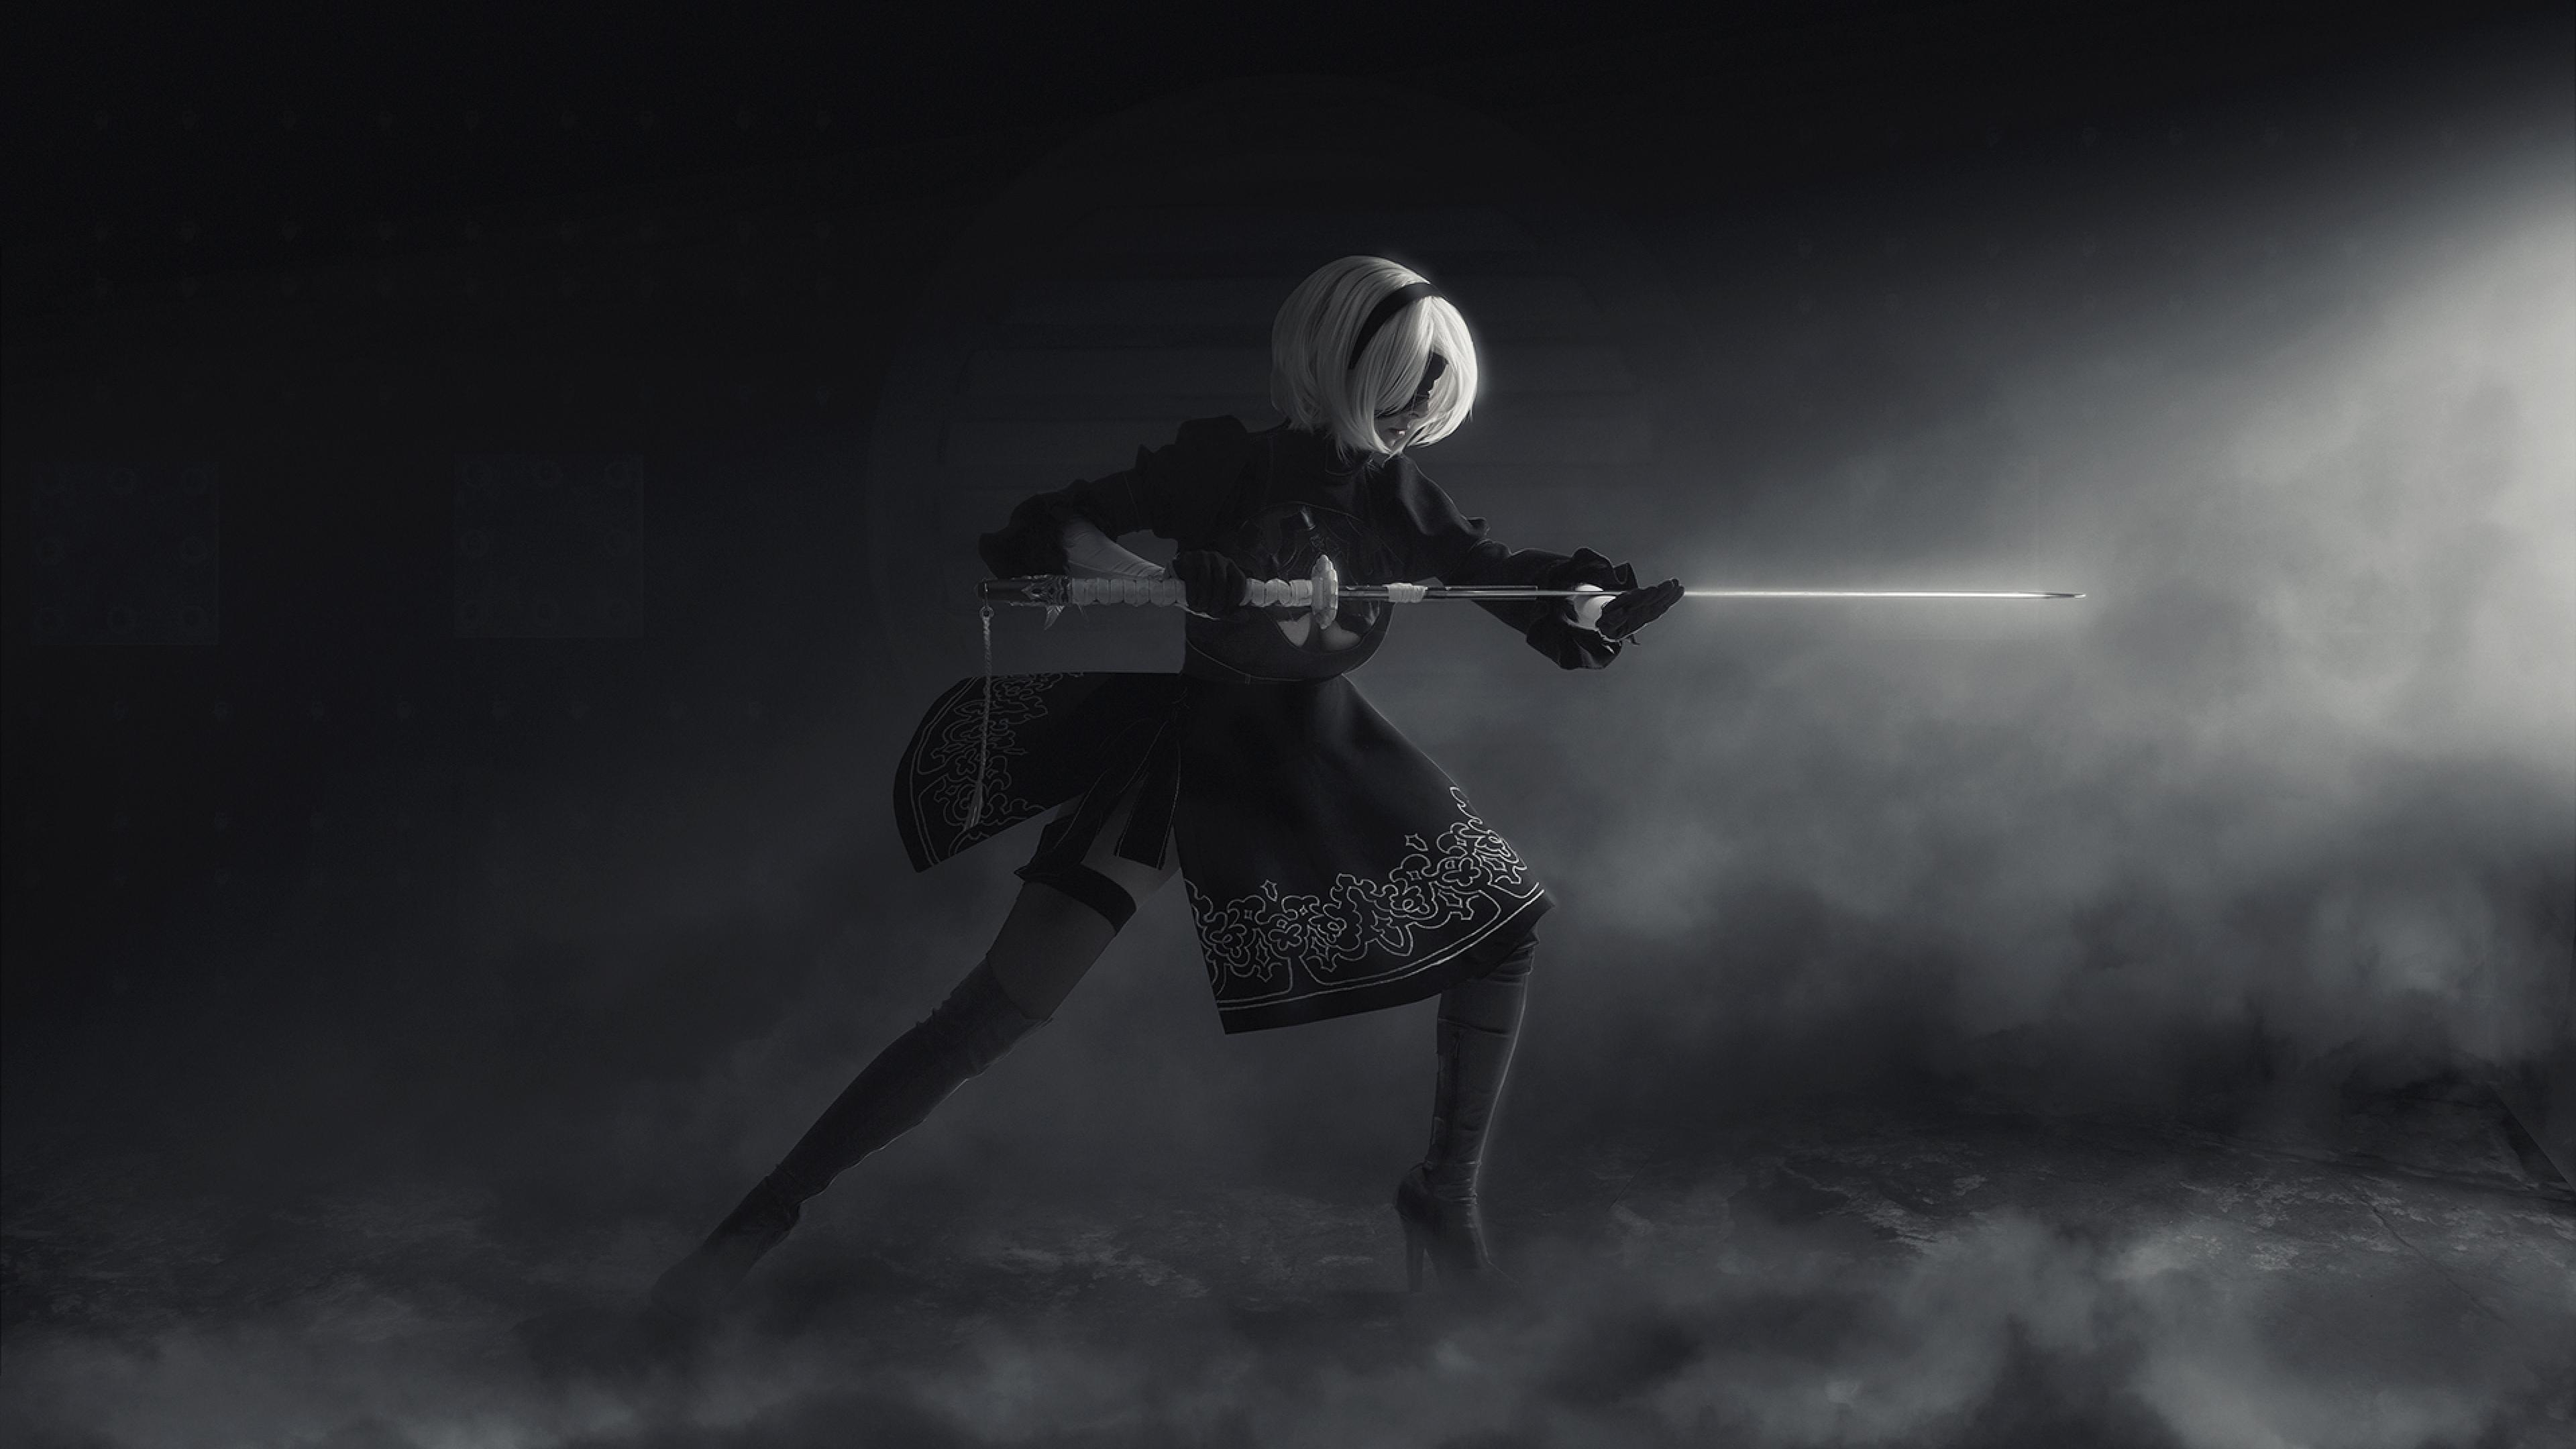 Nier Automata Cosplay, Full HD Wallpaper